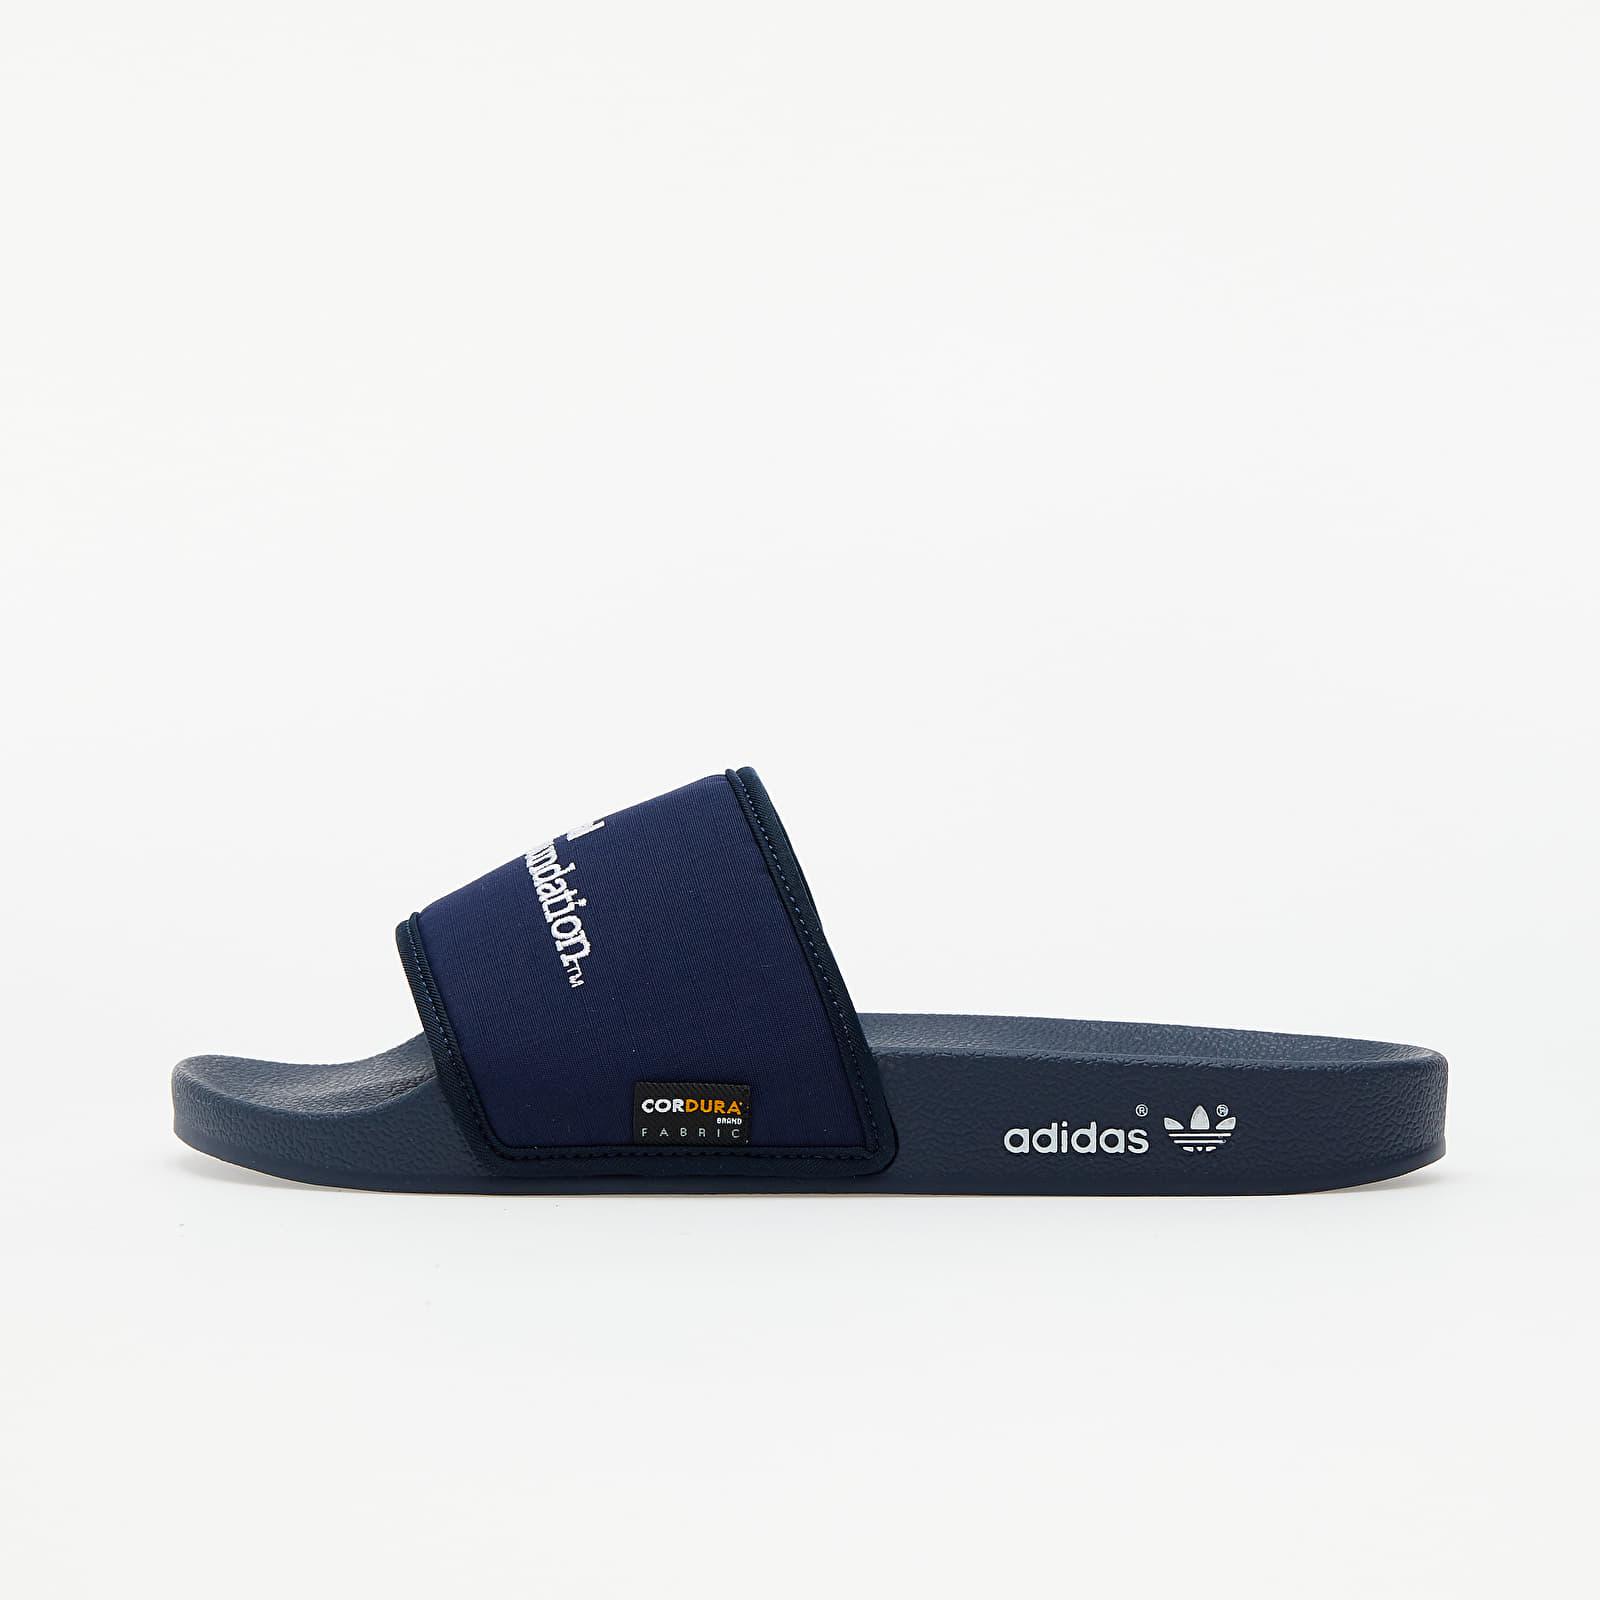 adidas Adilette Collegiate Navy/ Ftwr White/ Collegiate Navy FY5174